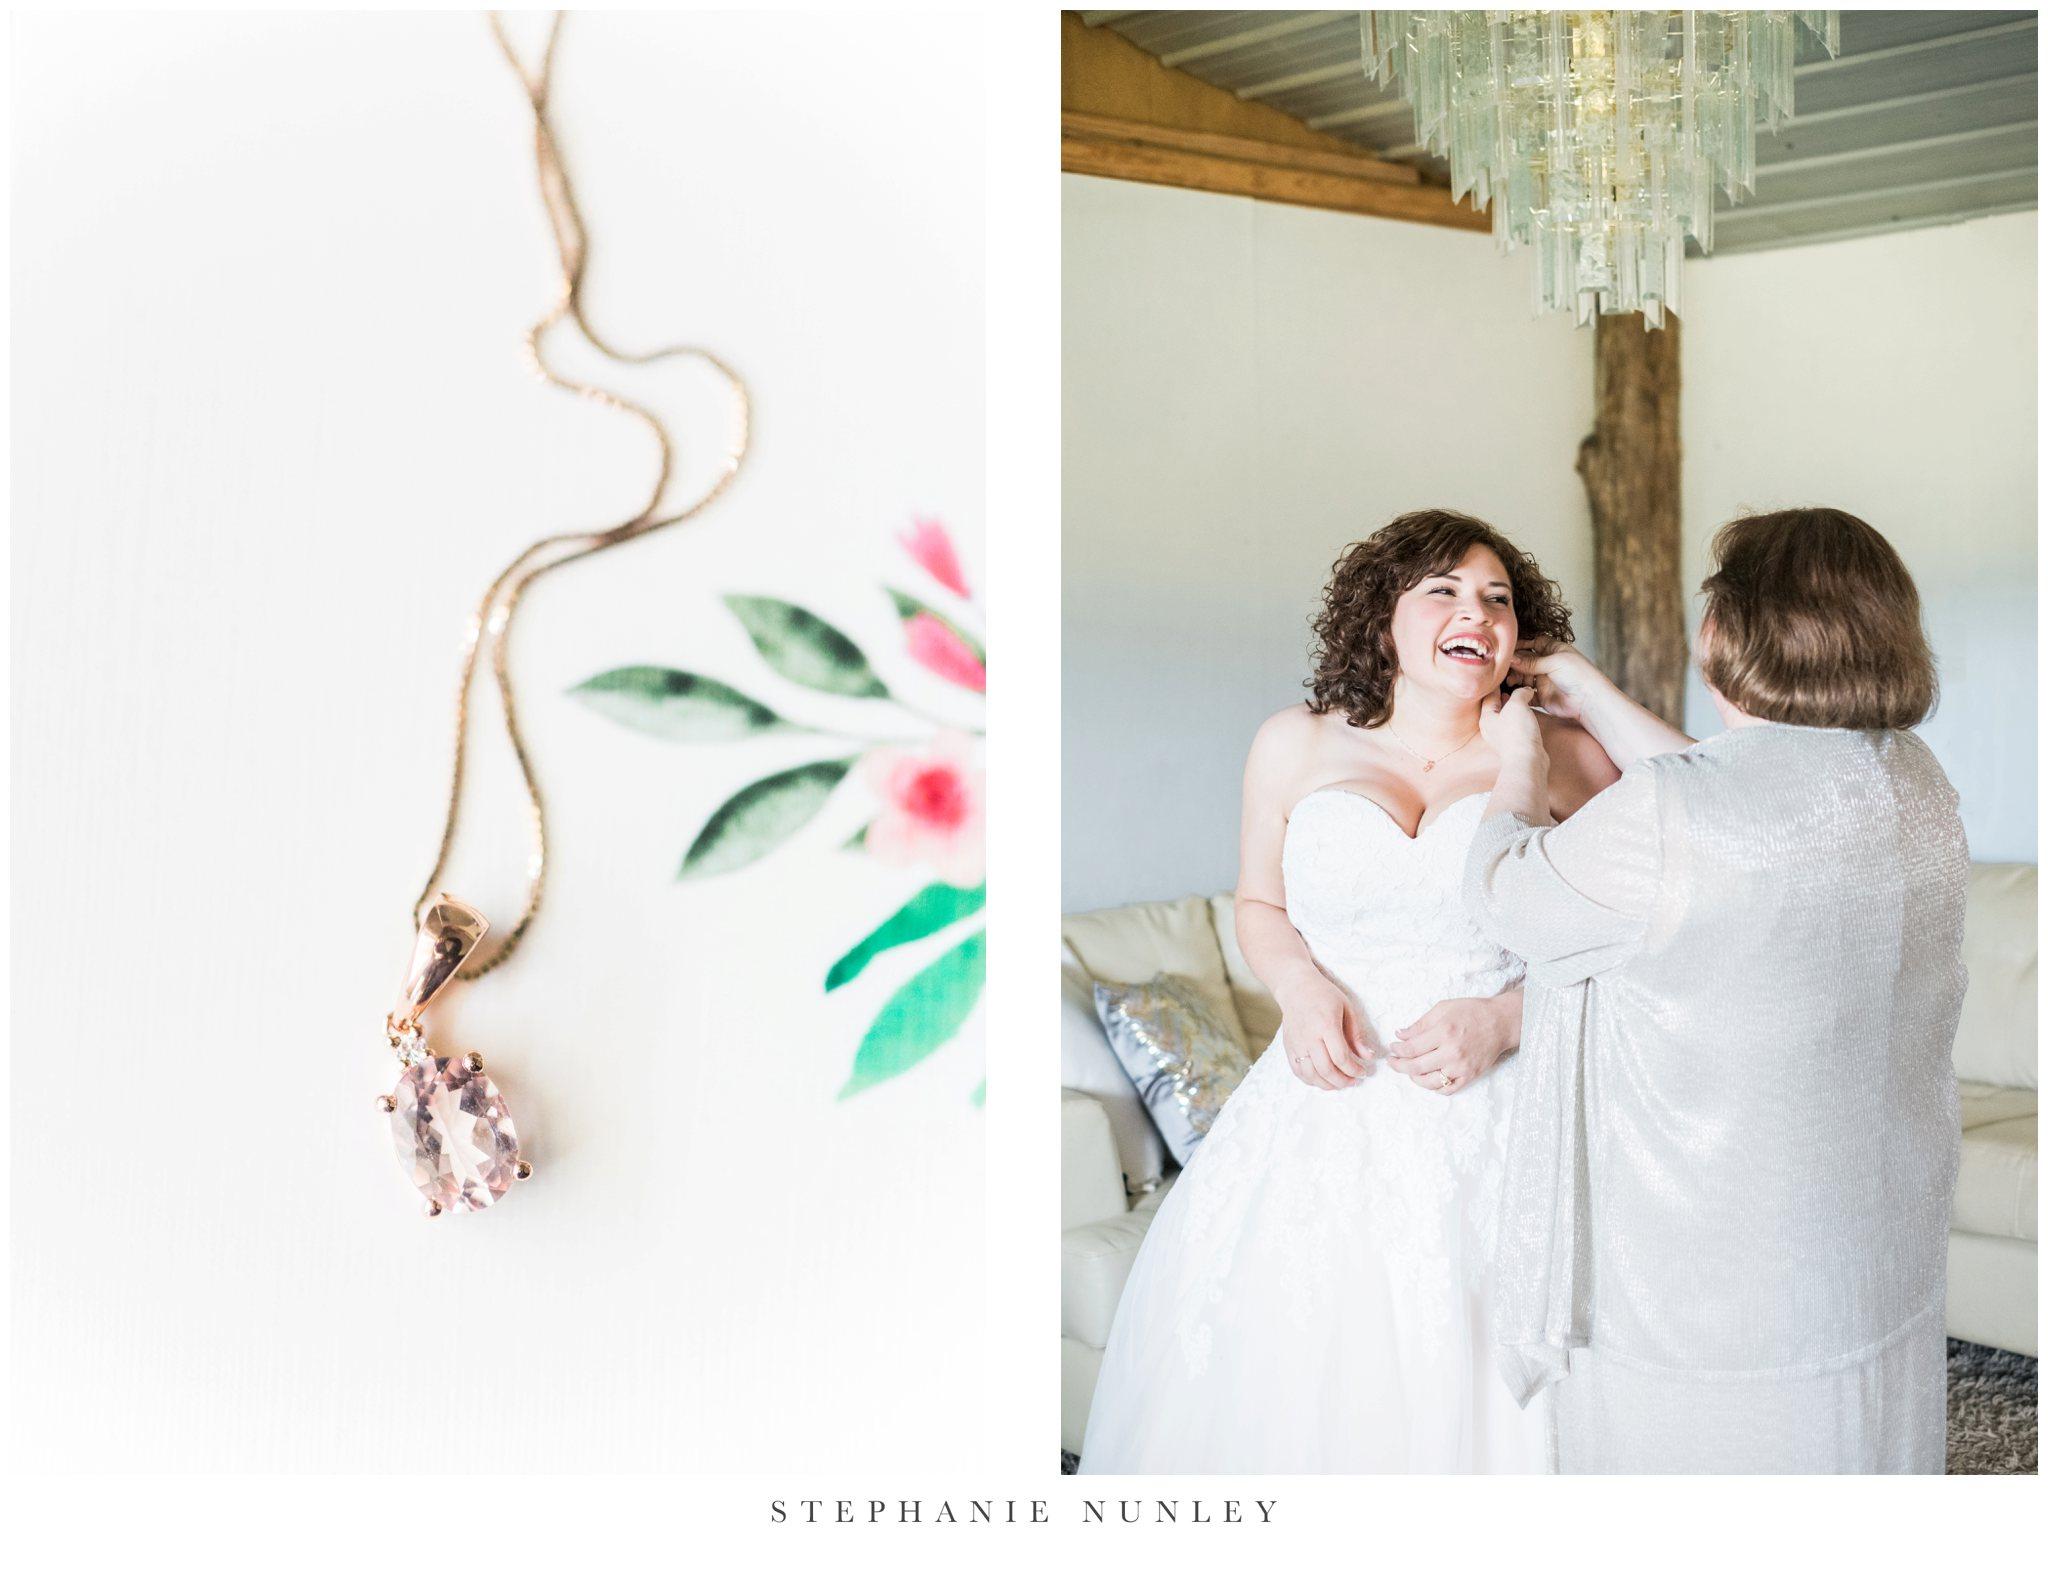 romantic-outdoor-wedding-with-flower-crown-0002.jpg